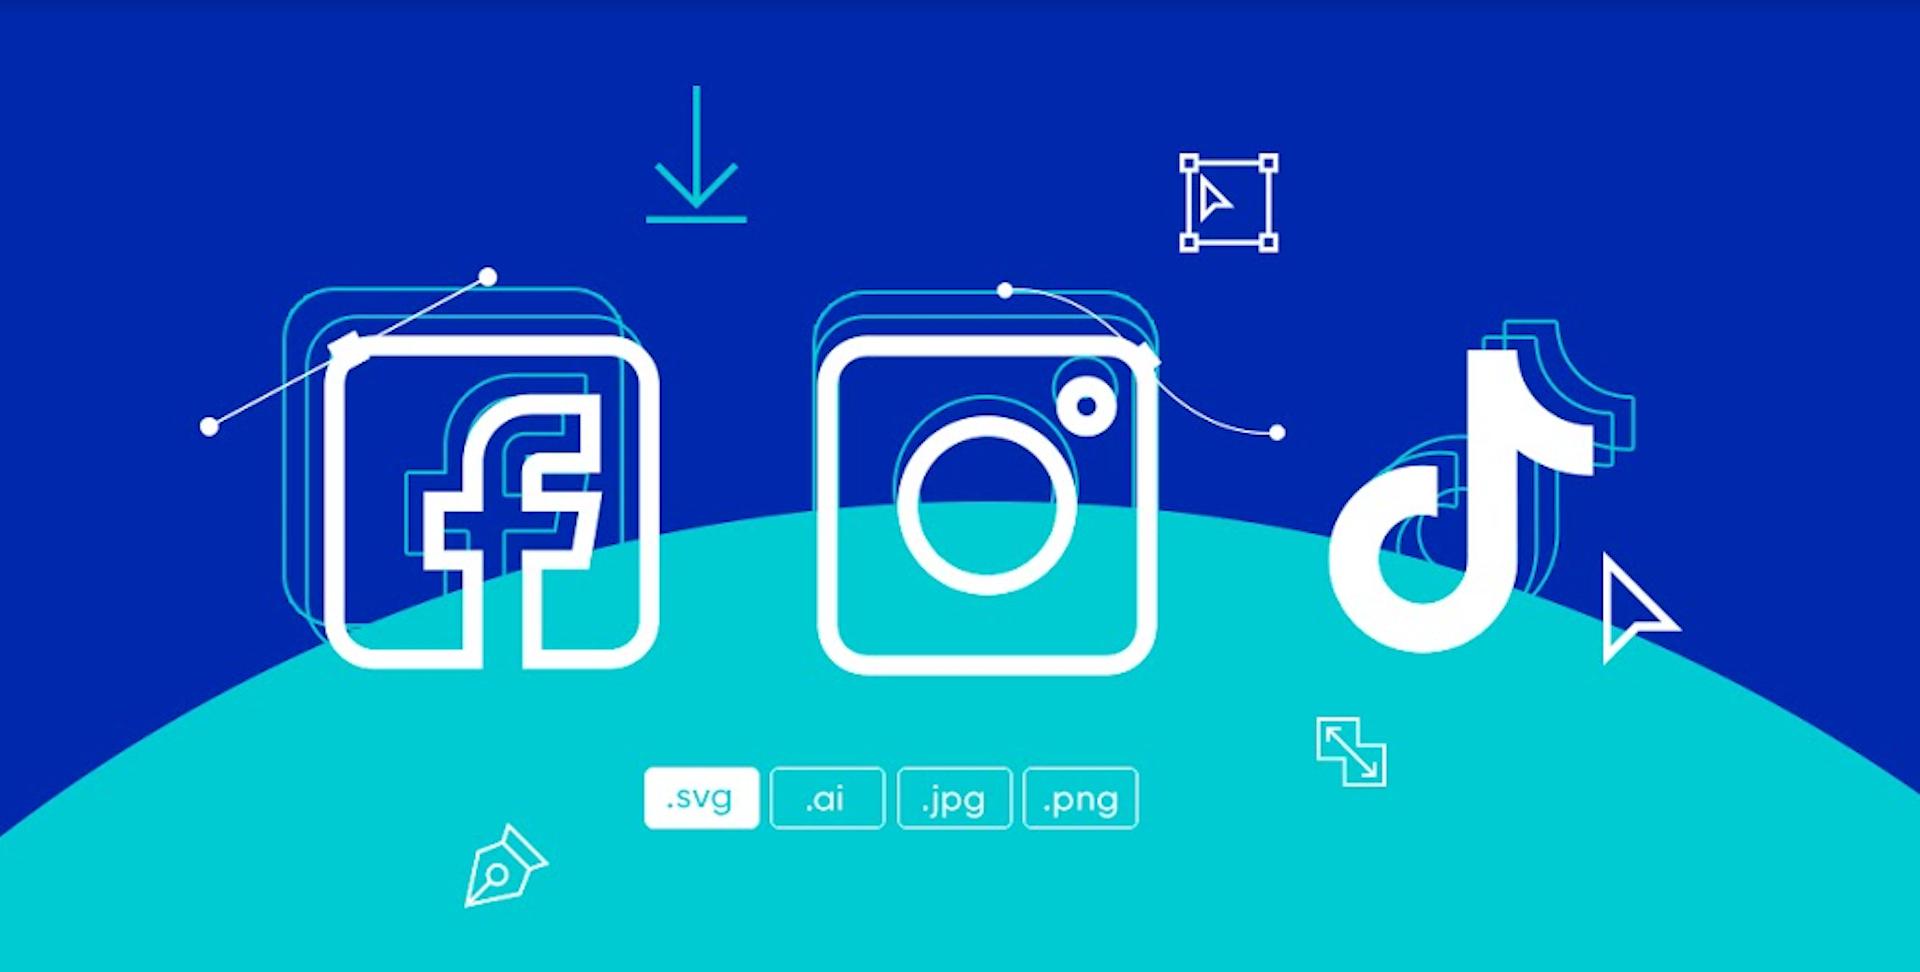 ¿Descargar logos de redes vectorizados? Hazlo sin instalar programas